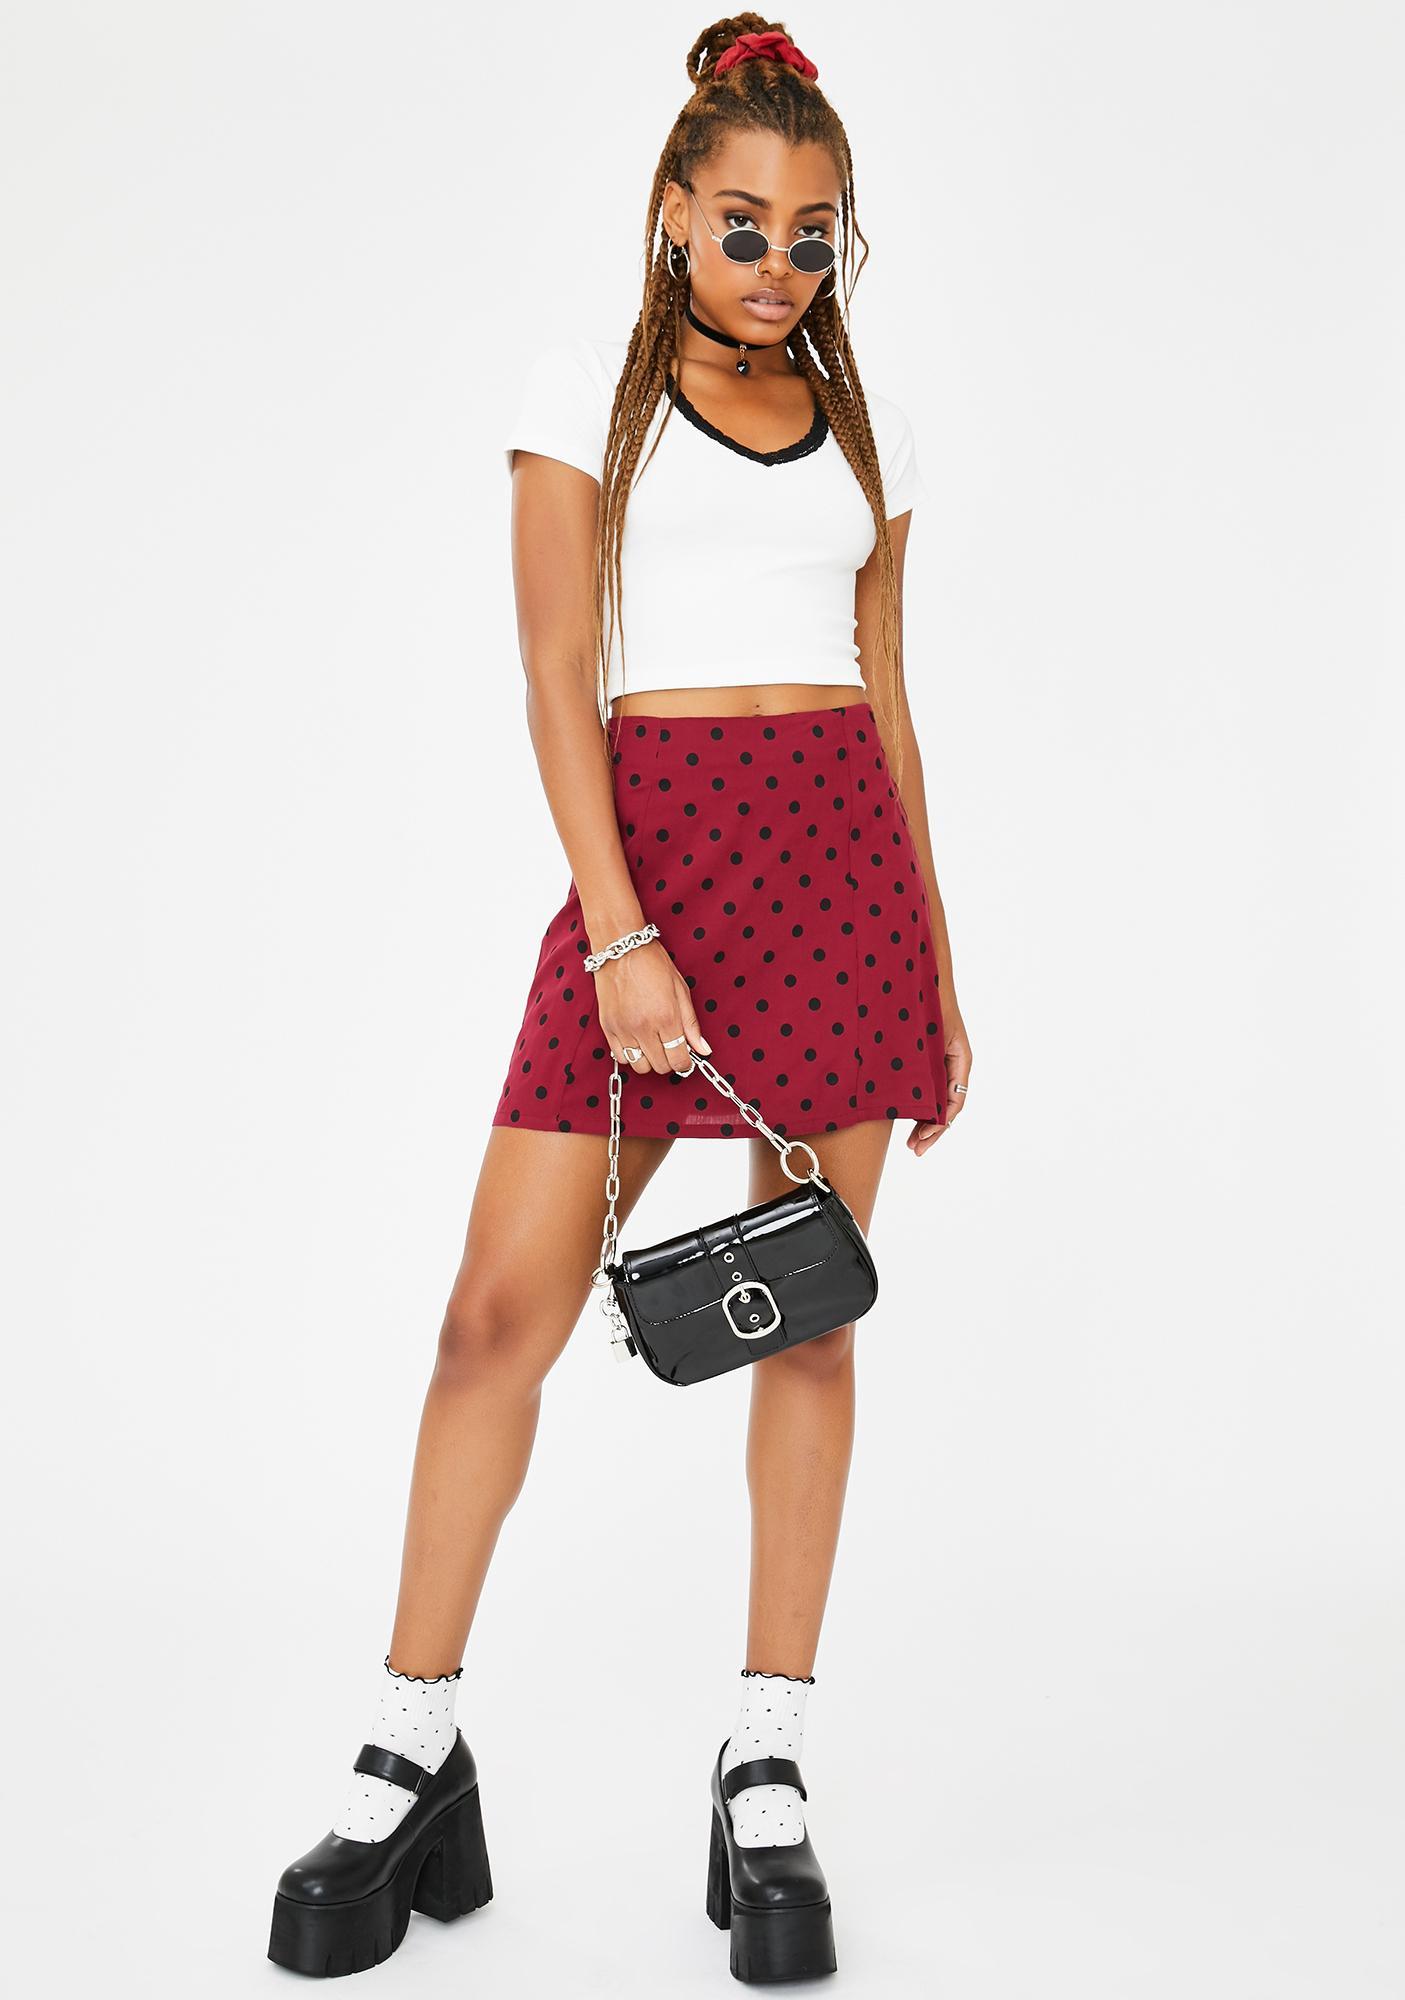 Current Mood Love Notes Polka Dot Skirt